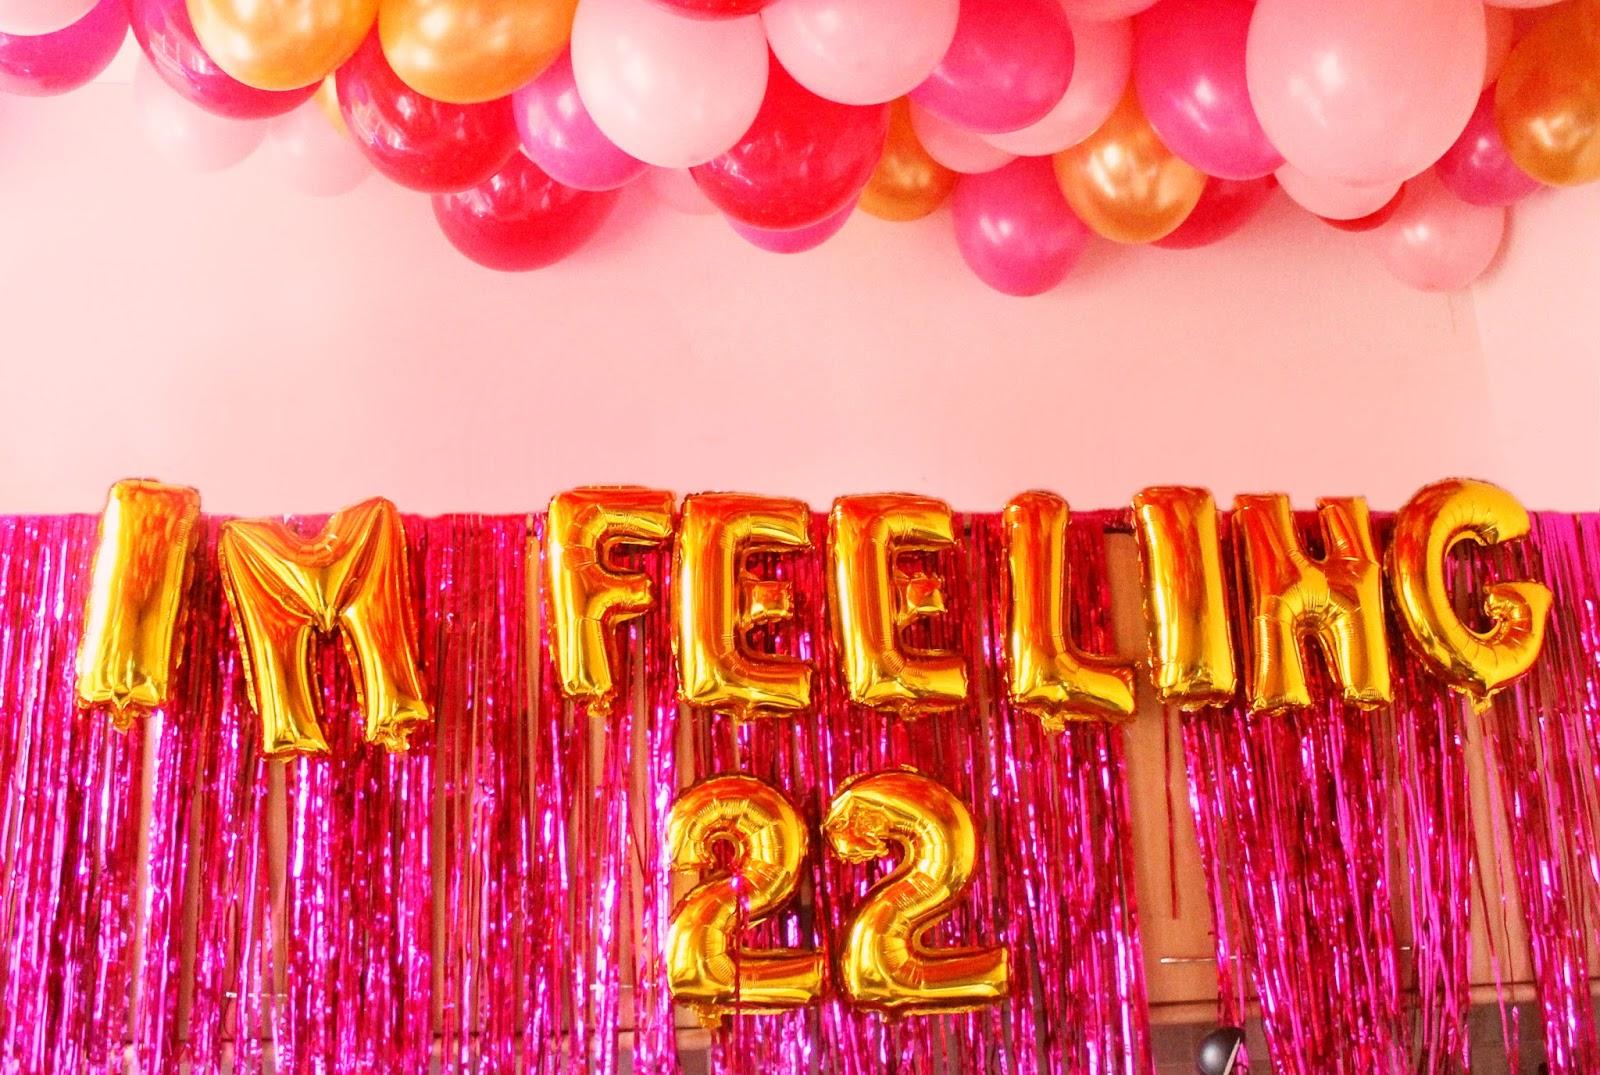 Now that\'s pretty: Glitter Unicorn Party